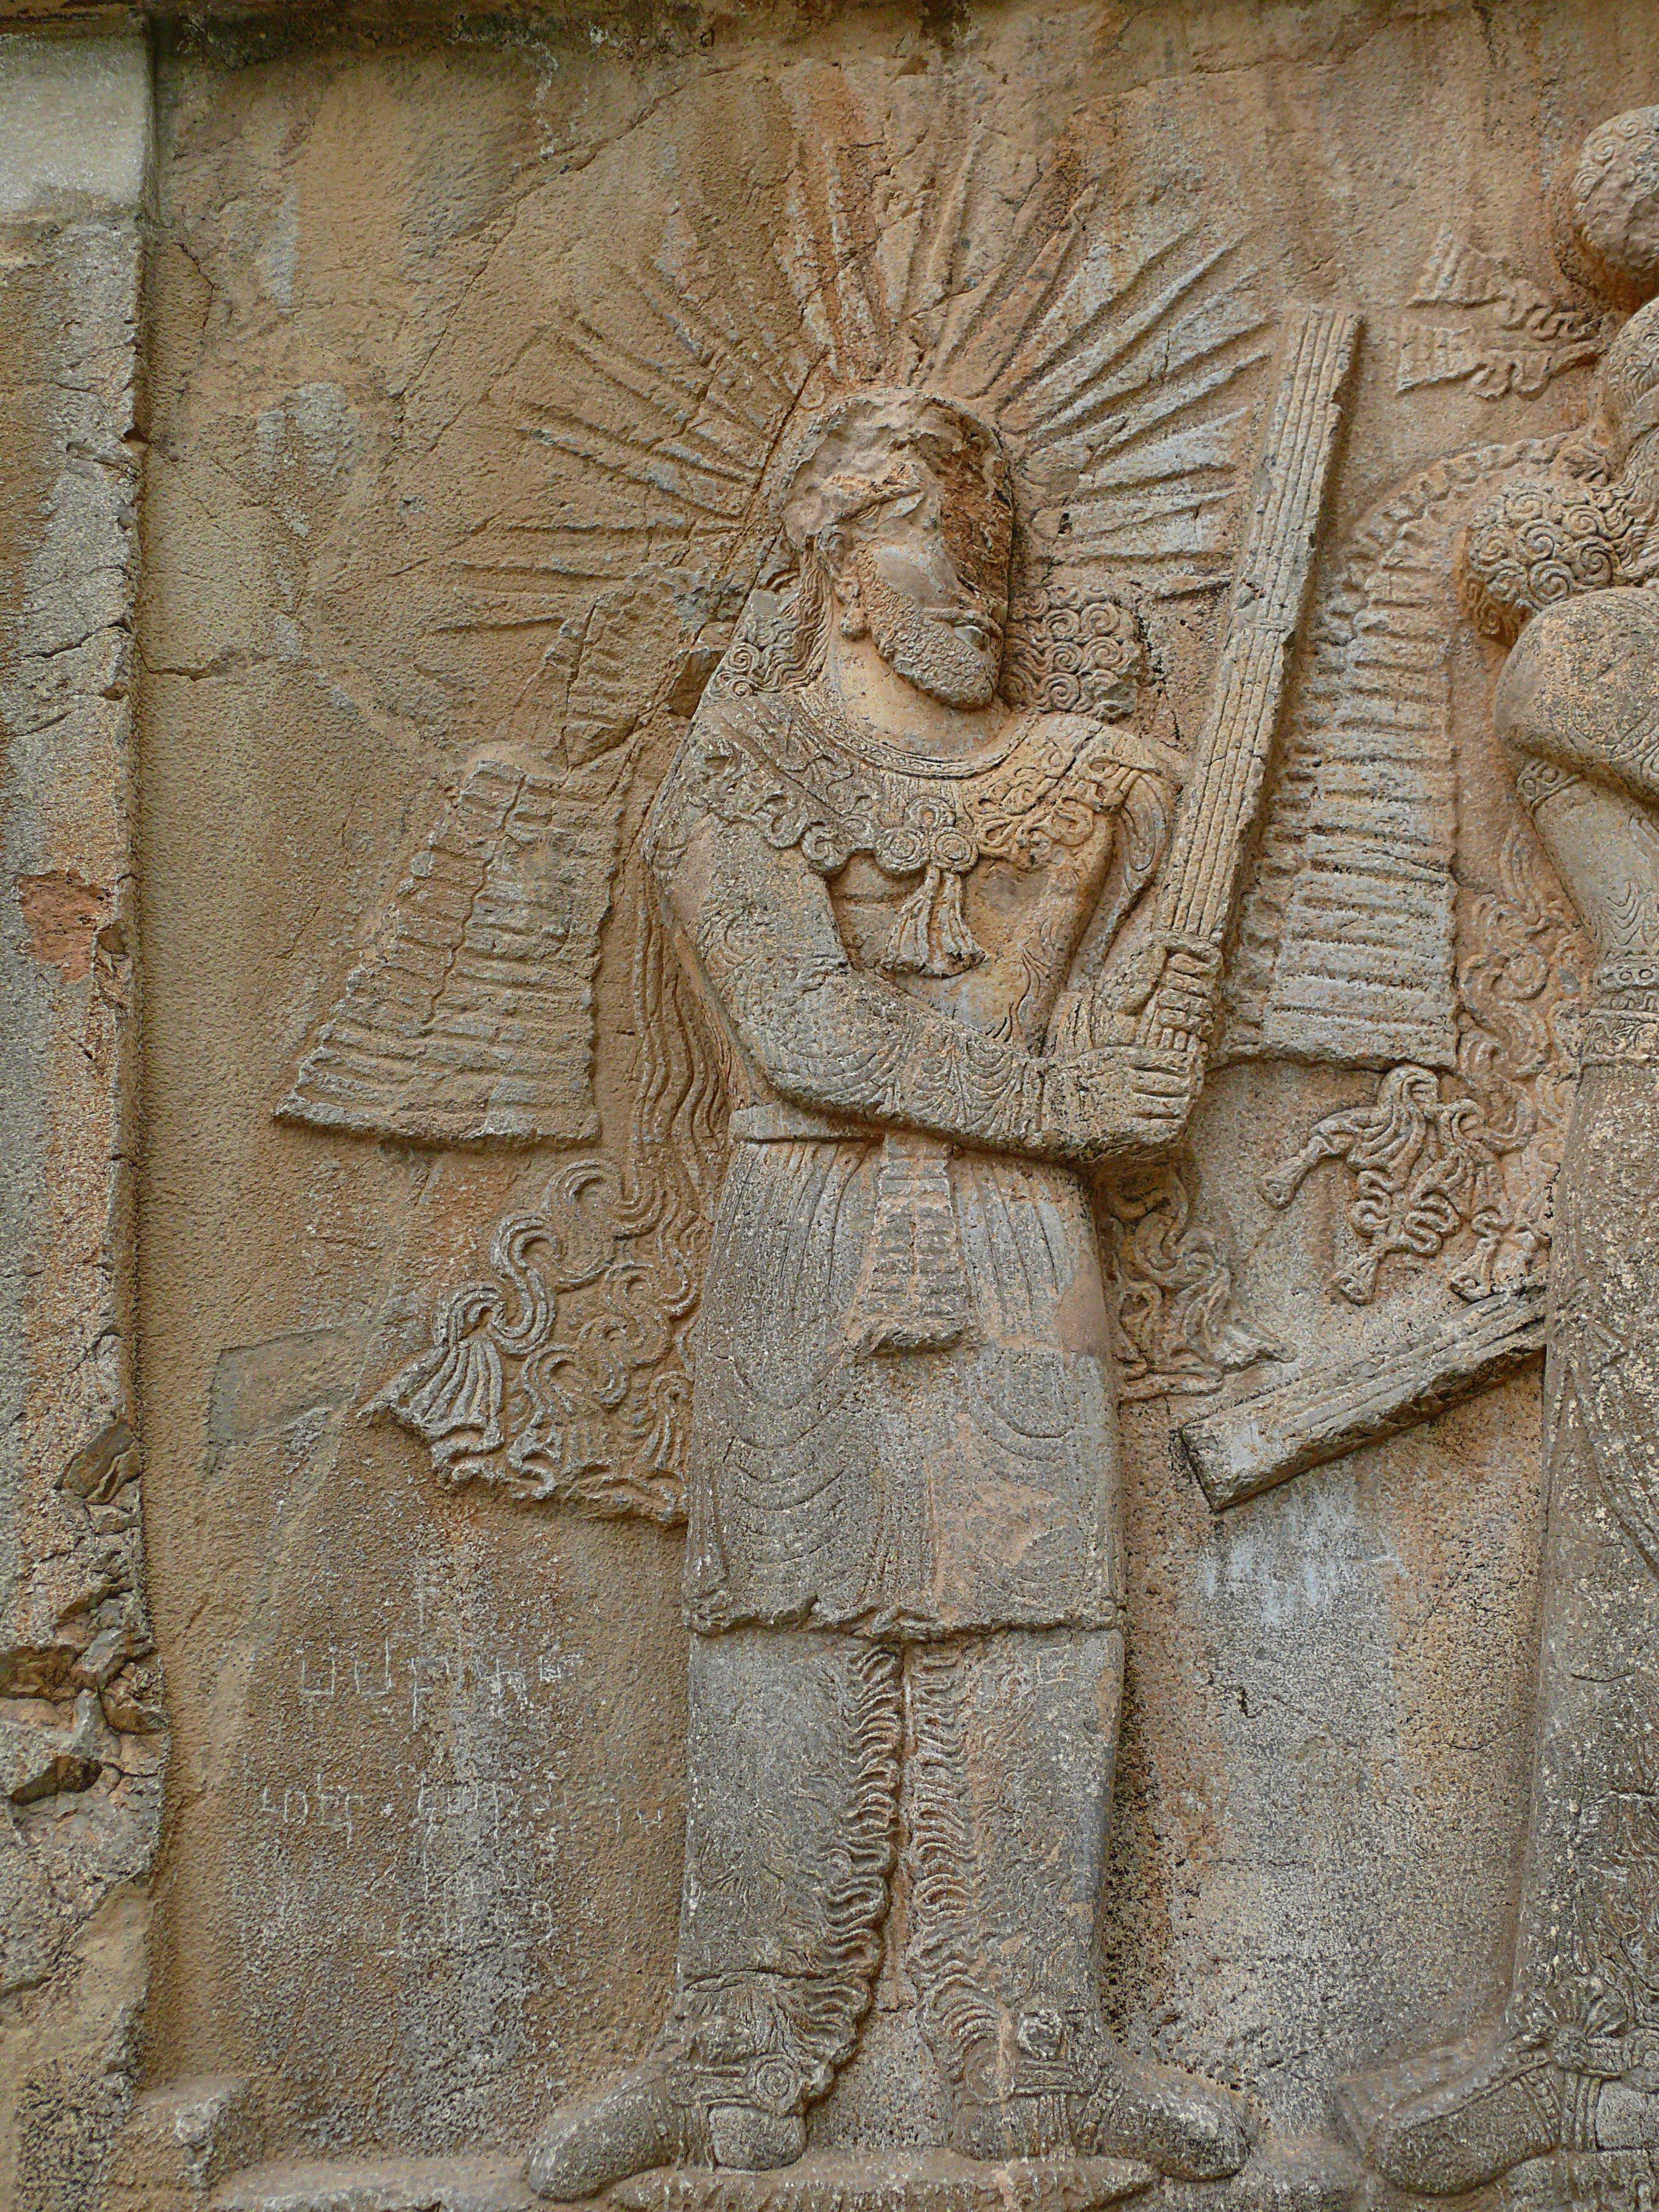 Mithra - Wikipedia